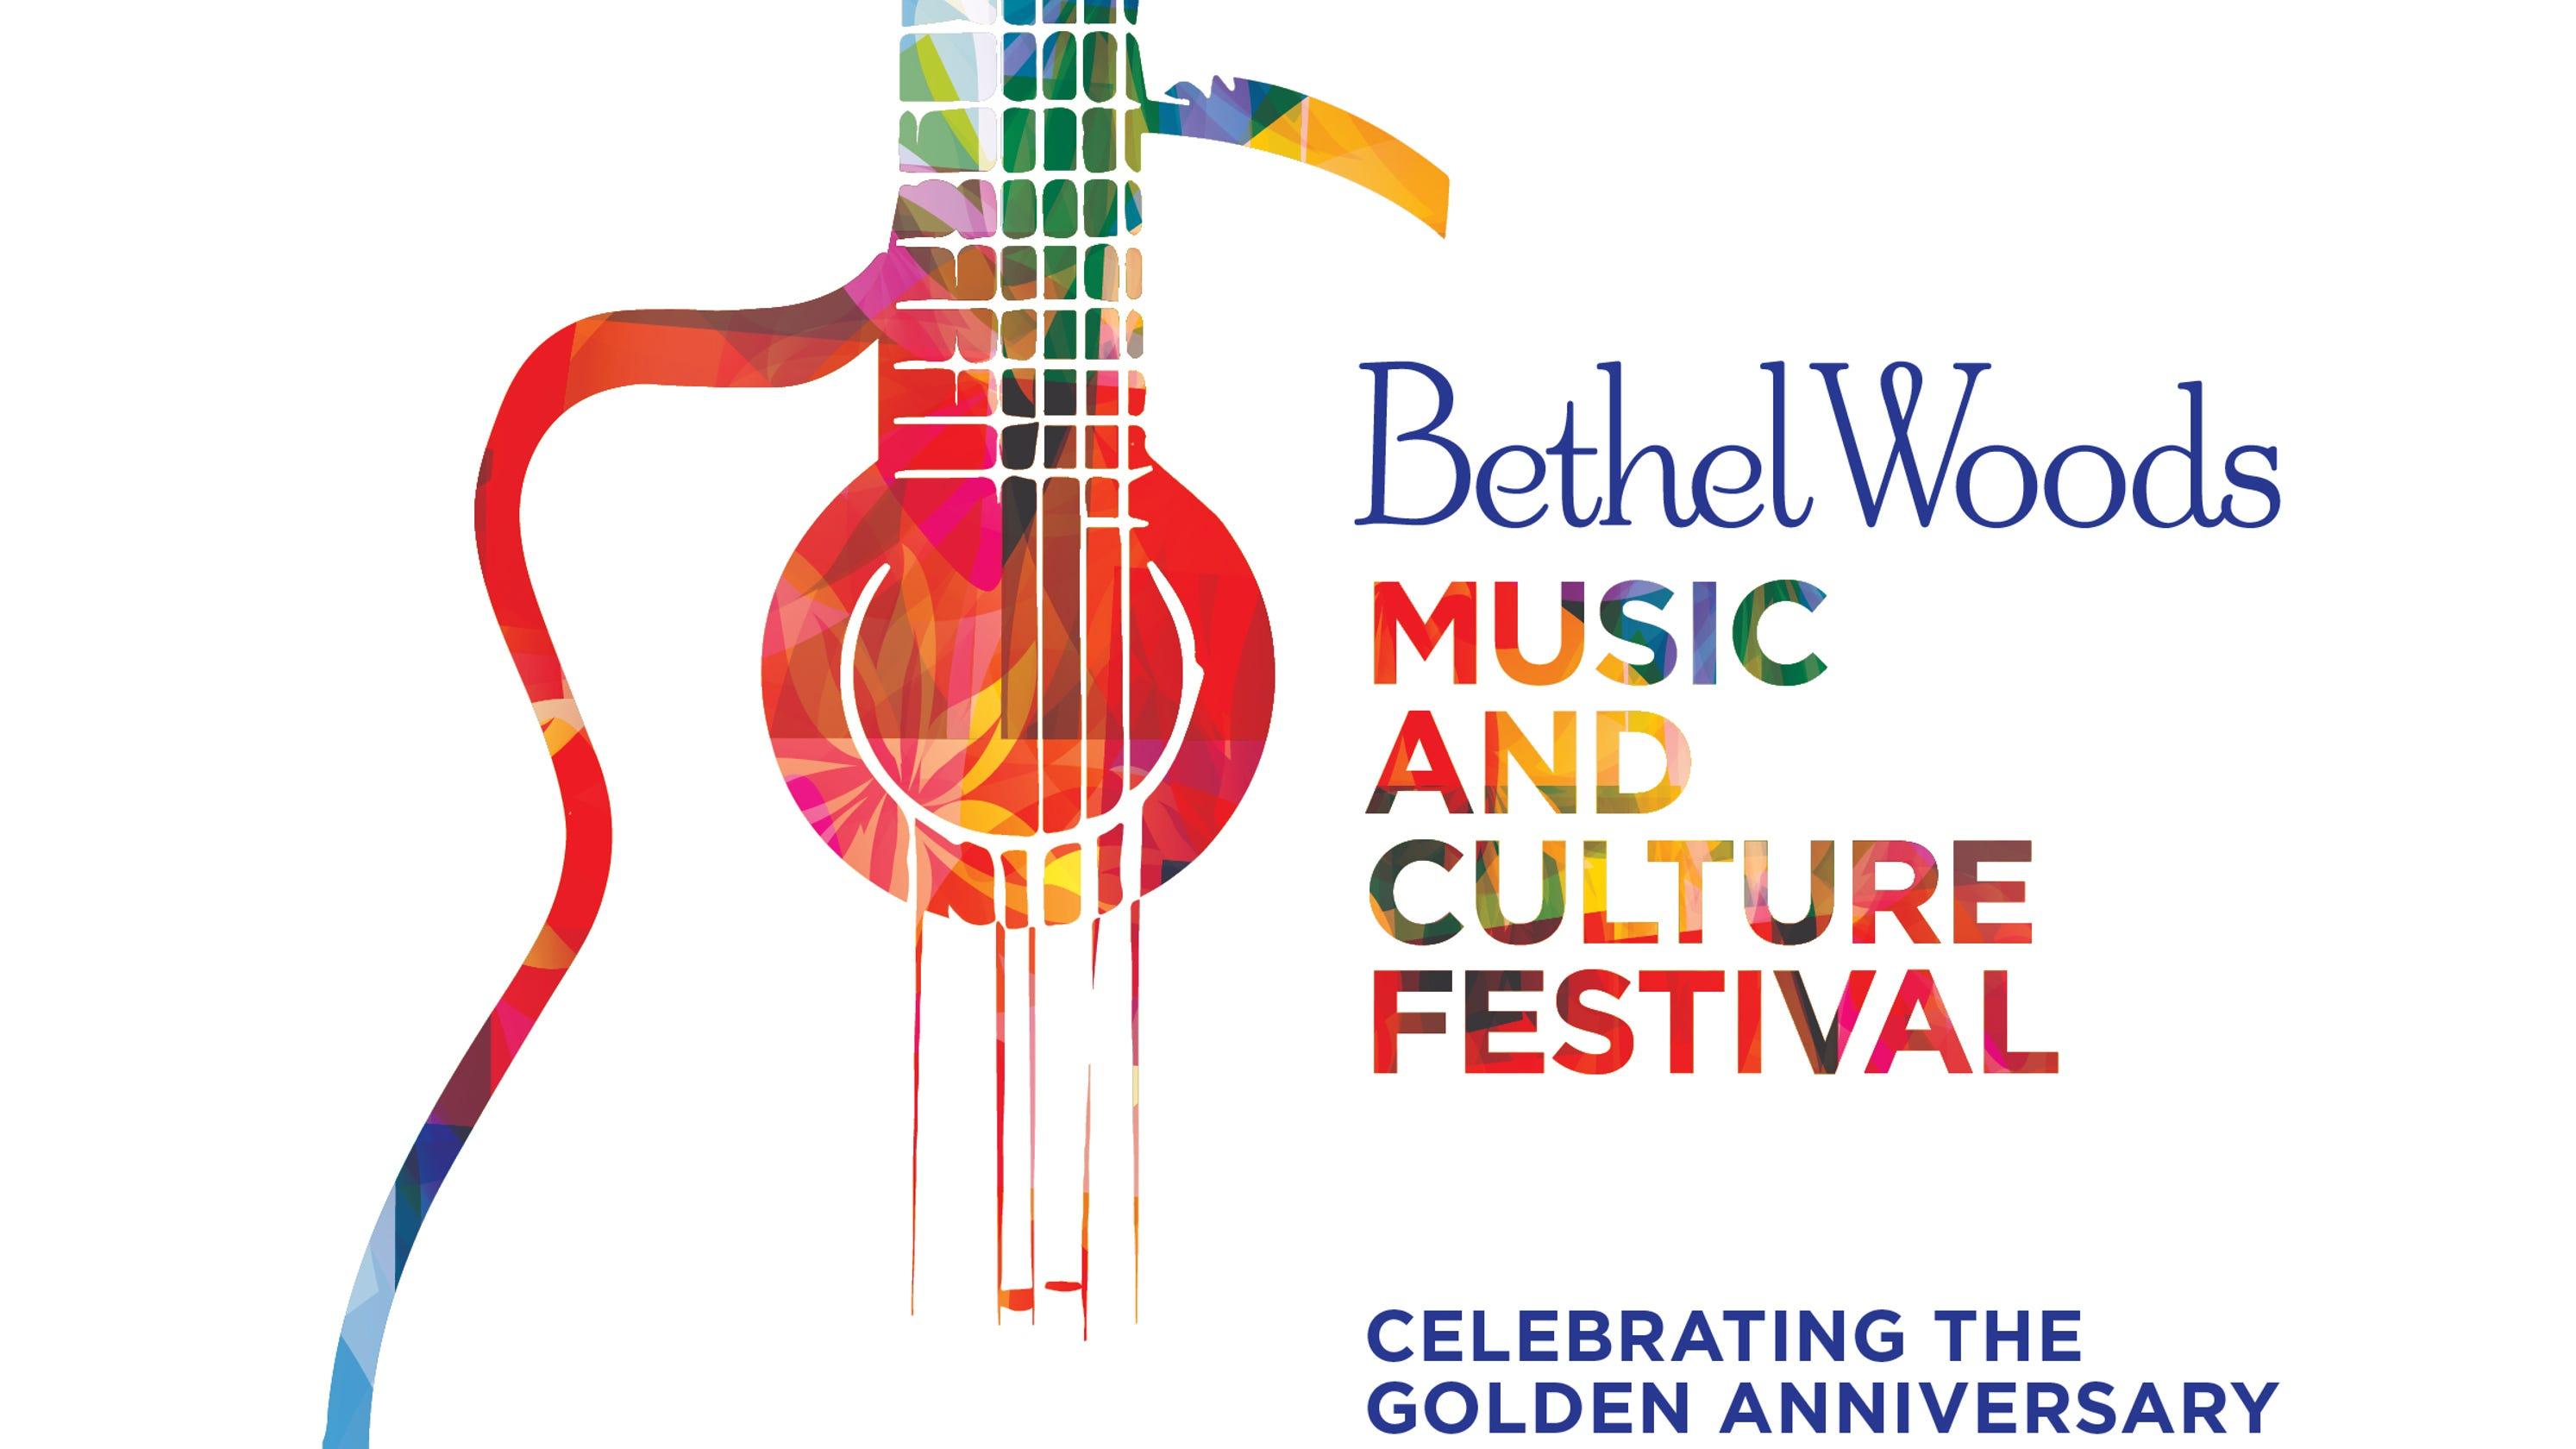 Woodstock: Bethel Woods to host 50th anniversary festival